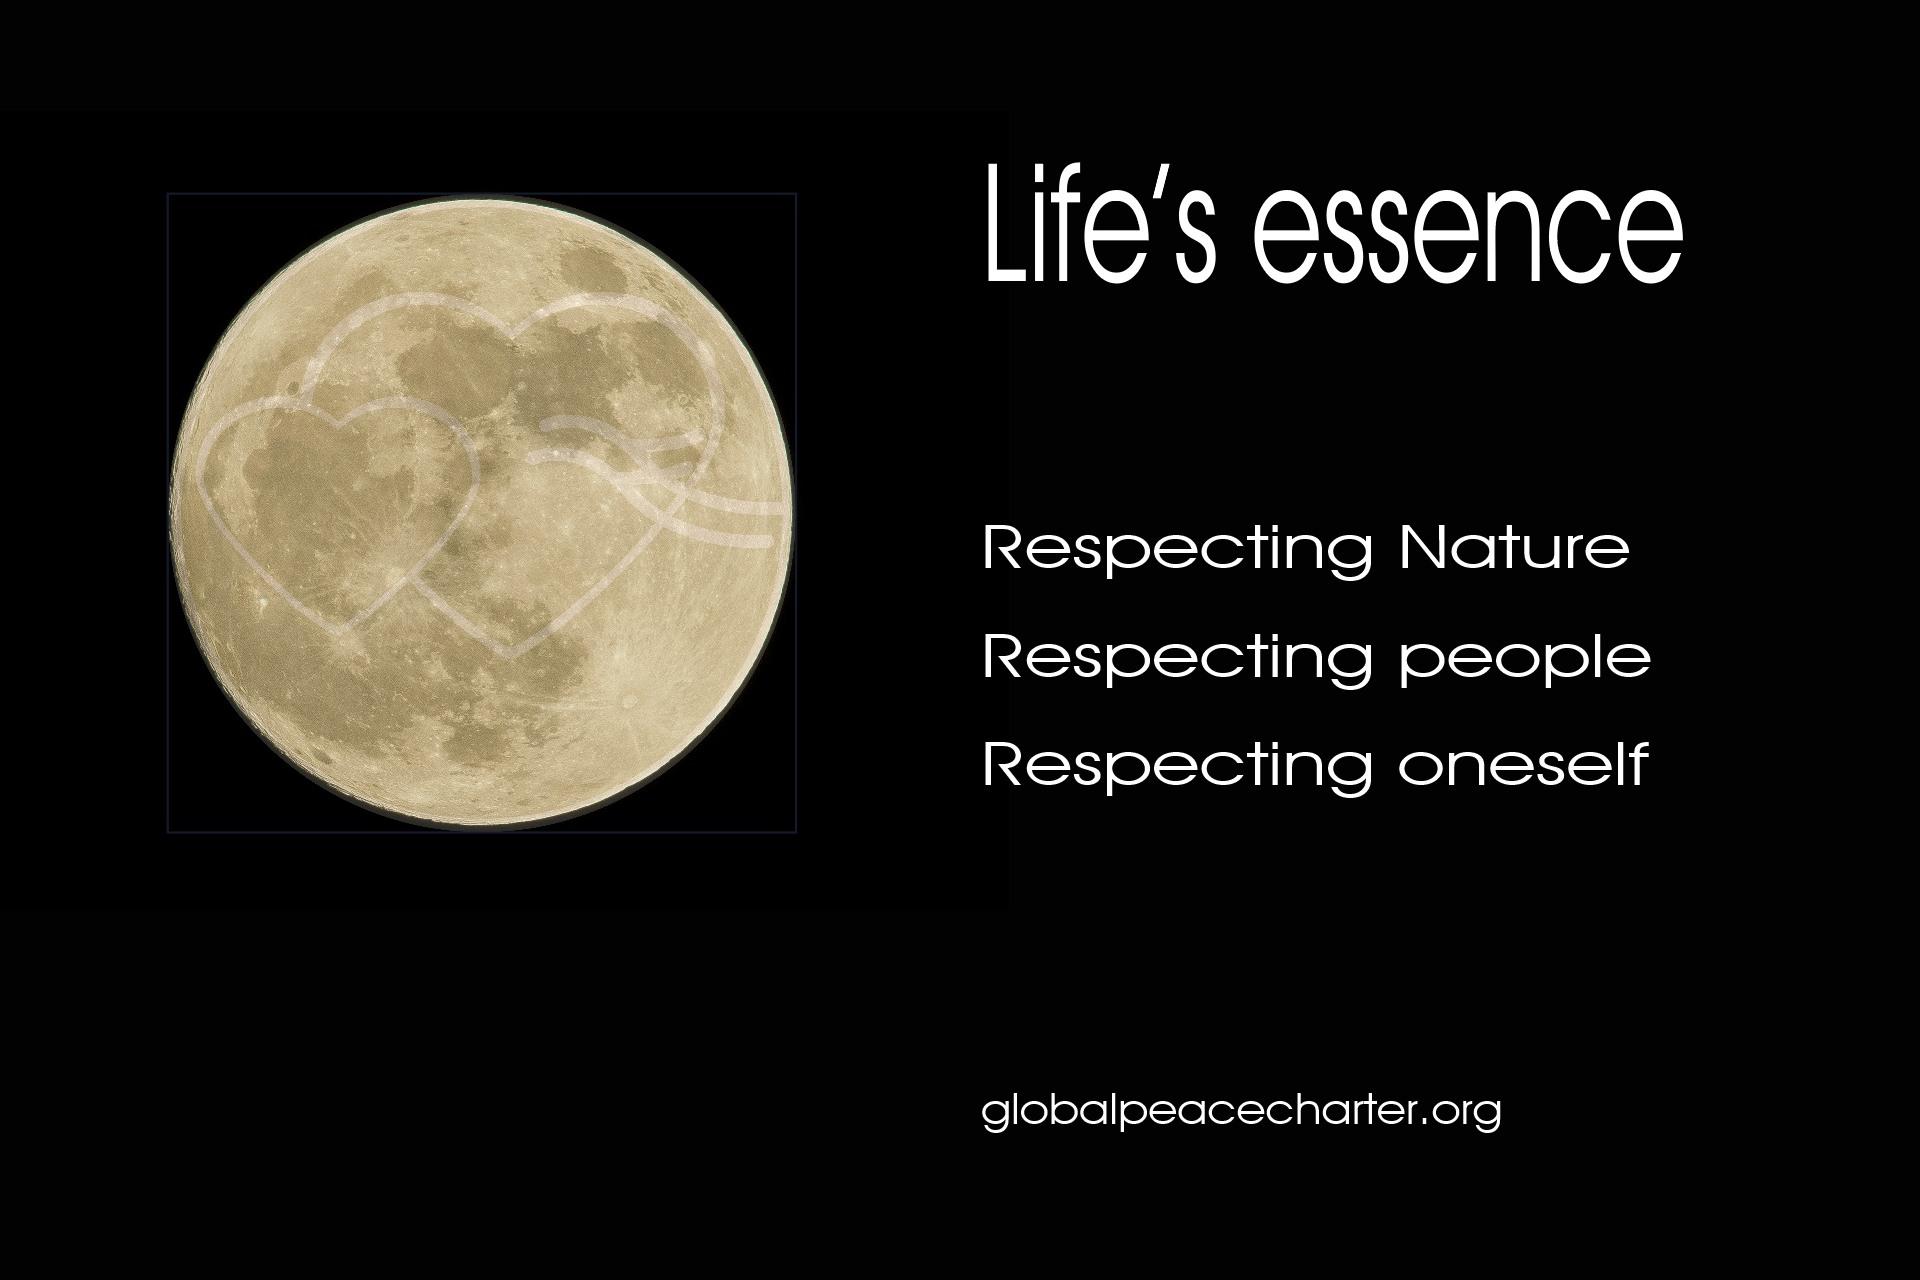 Life's essence